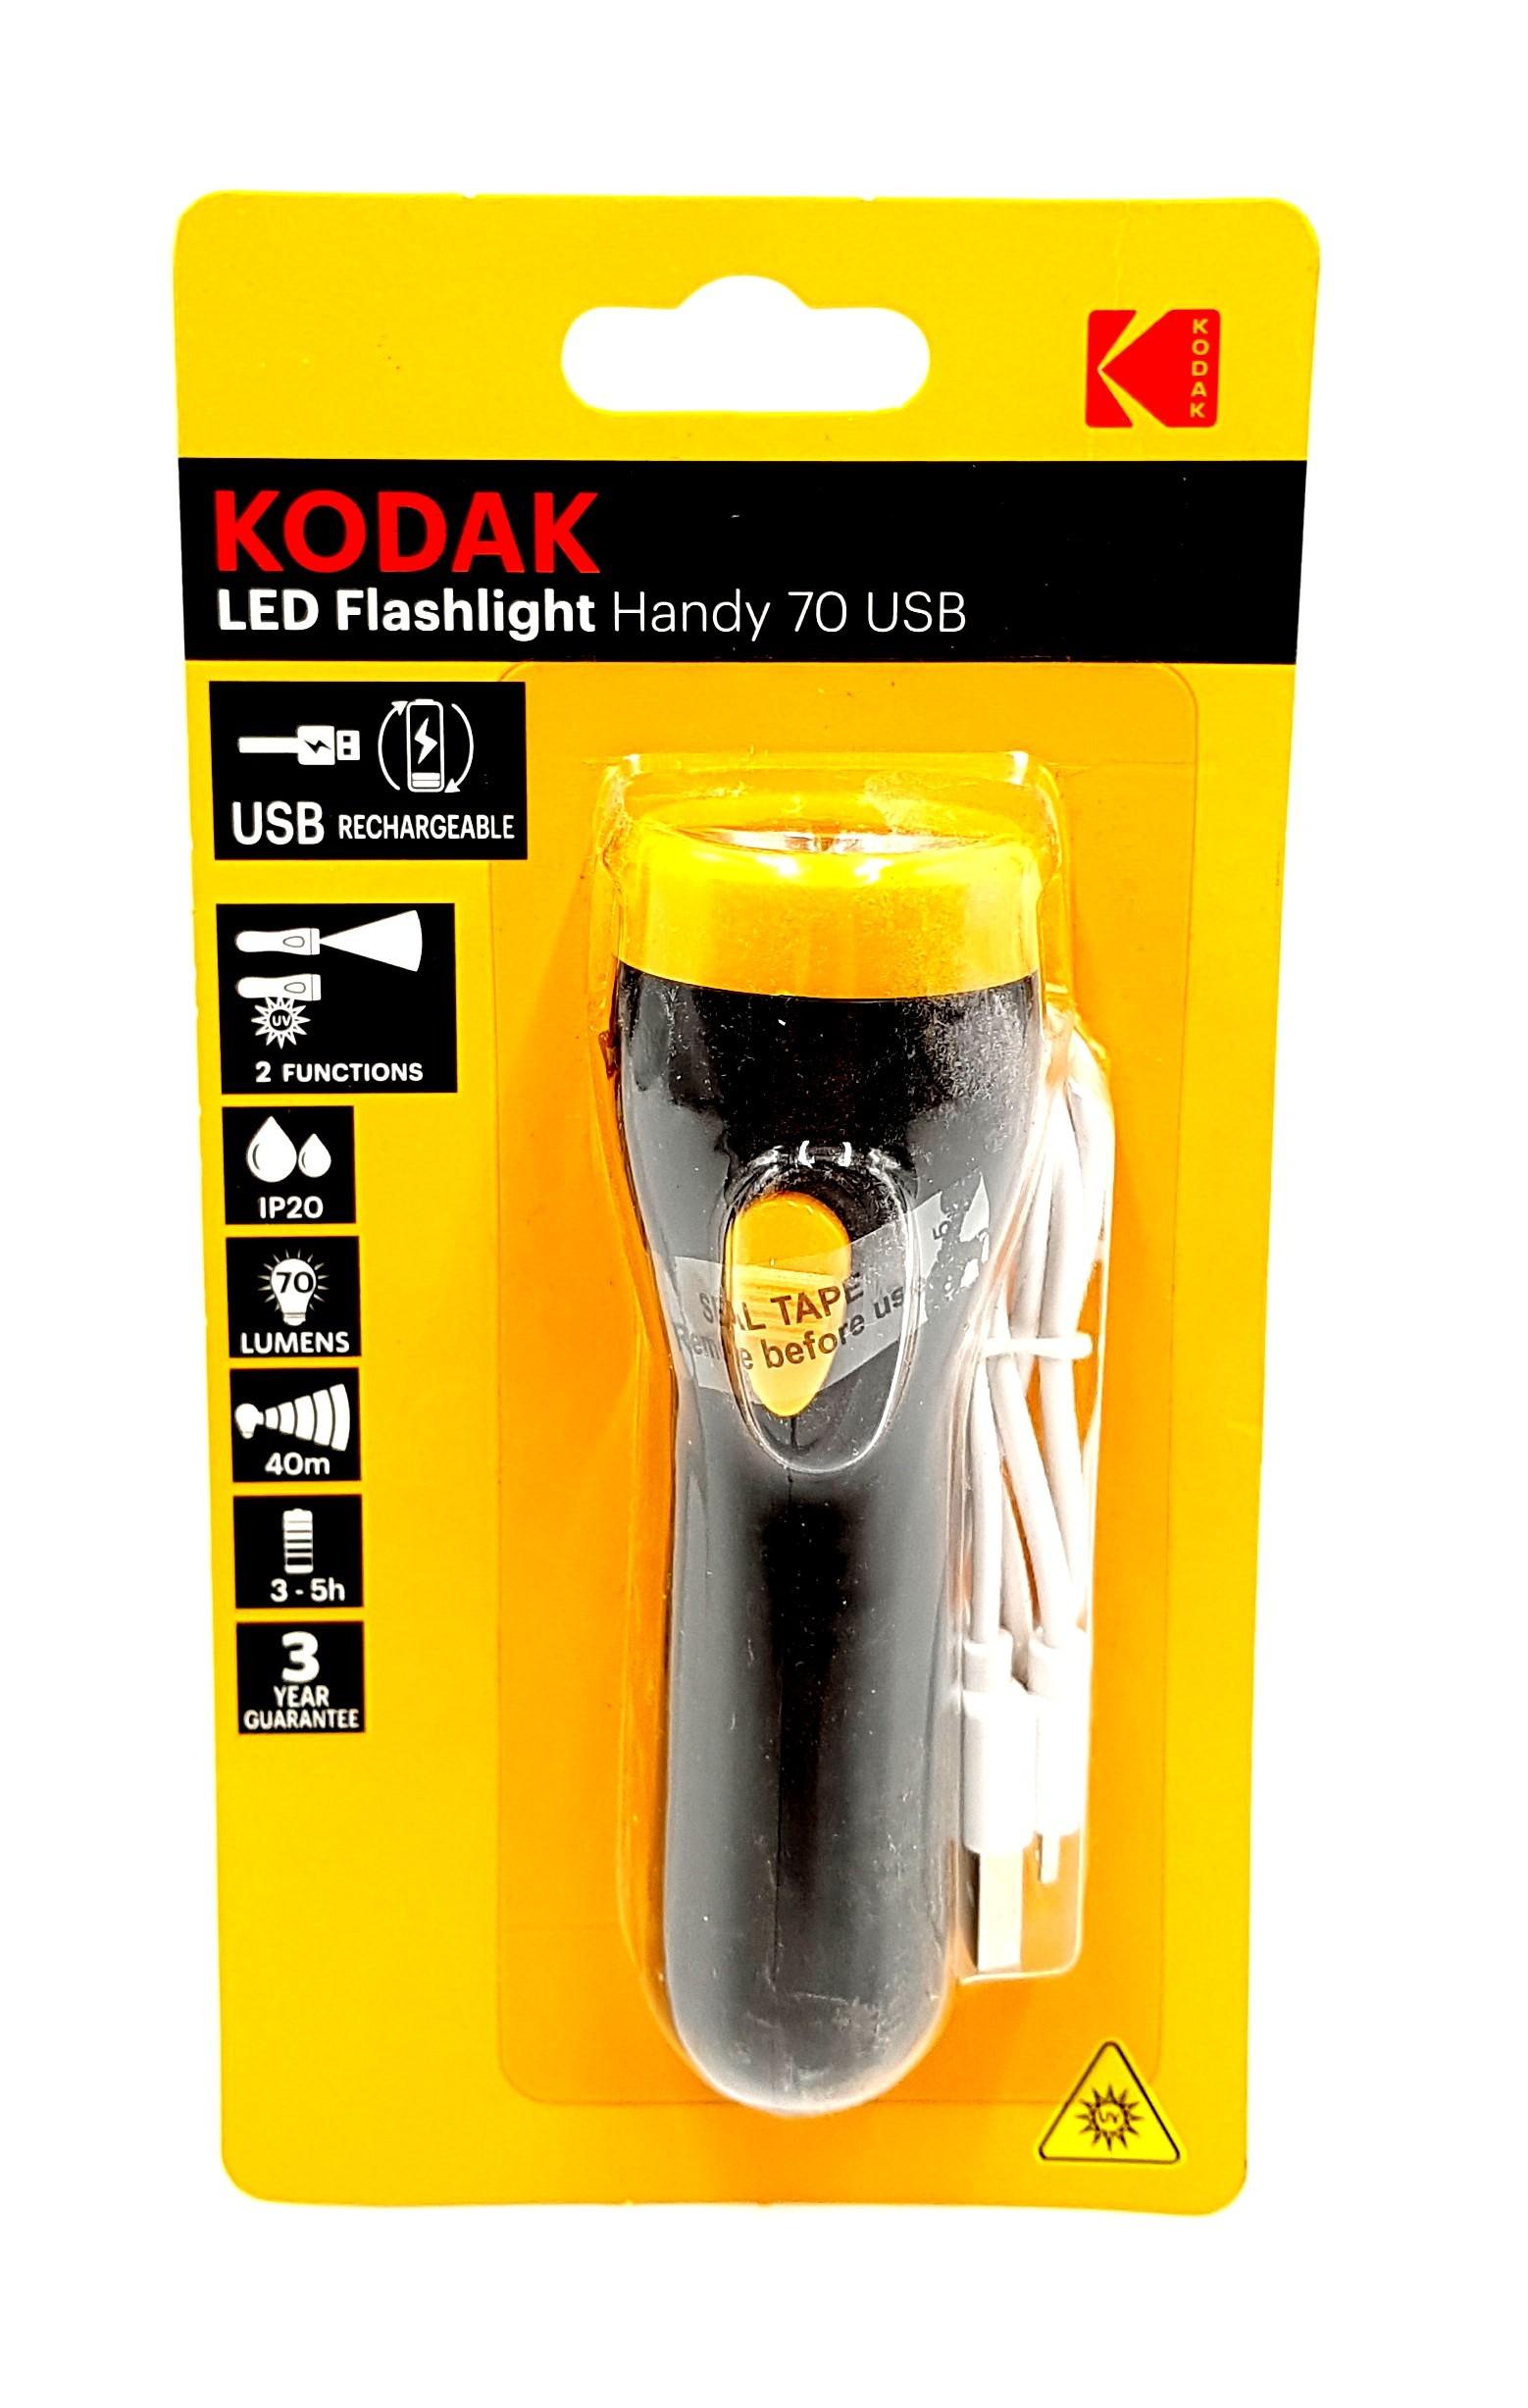 Lanterna LED KODAK Handy 70 USB imagine techstar.ro 2021